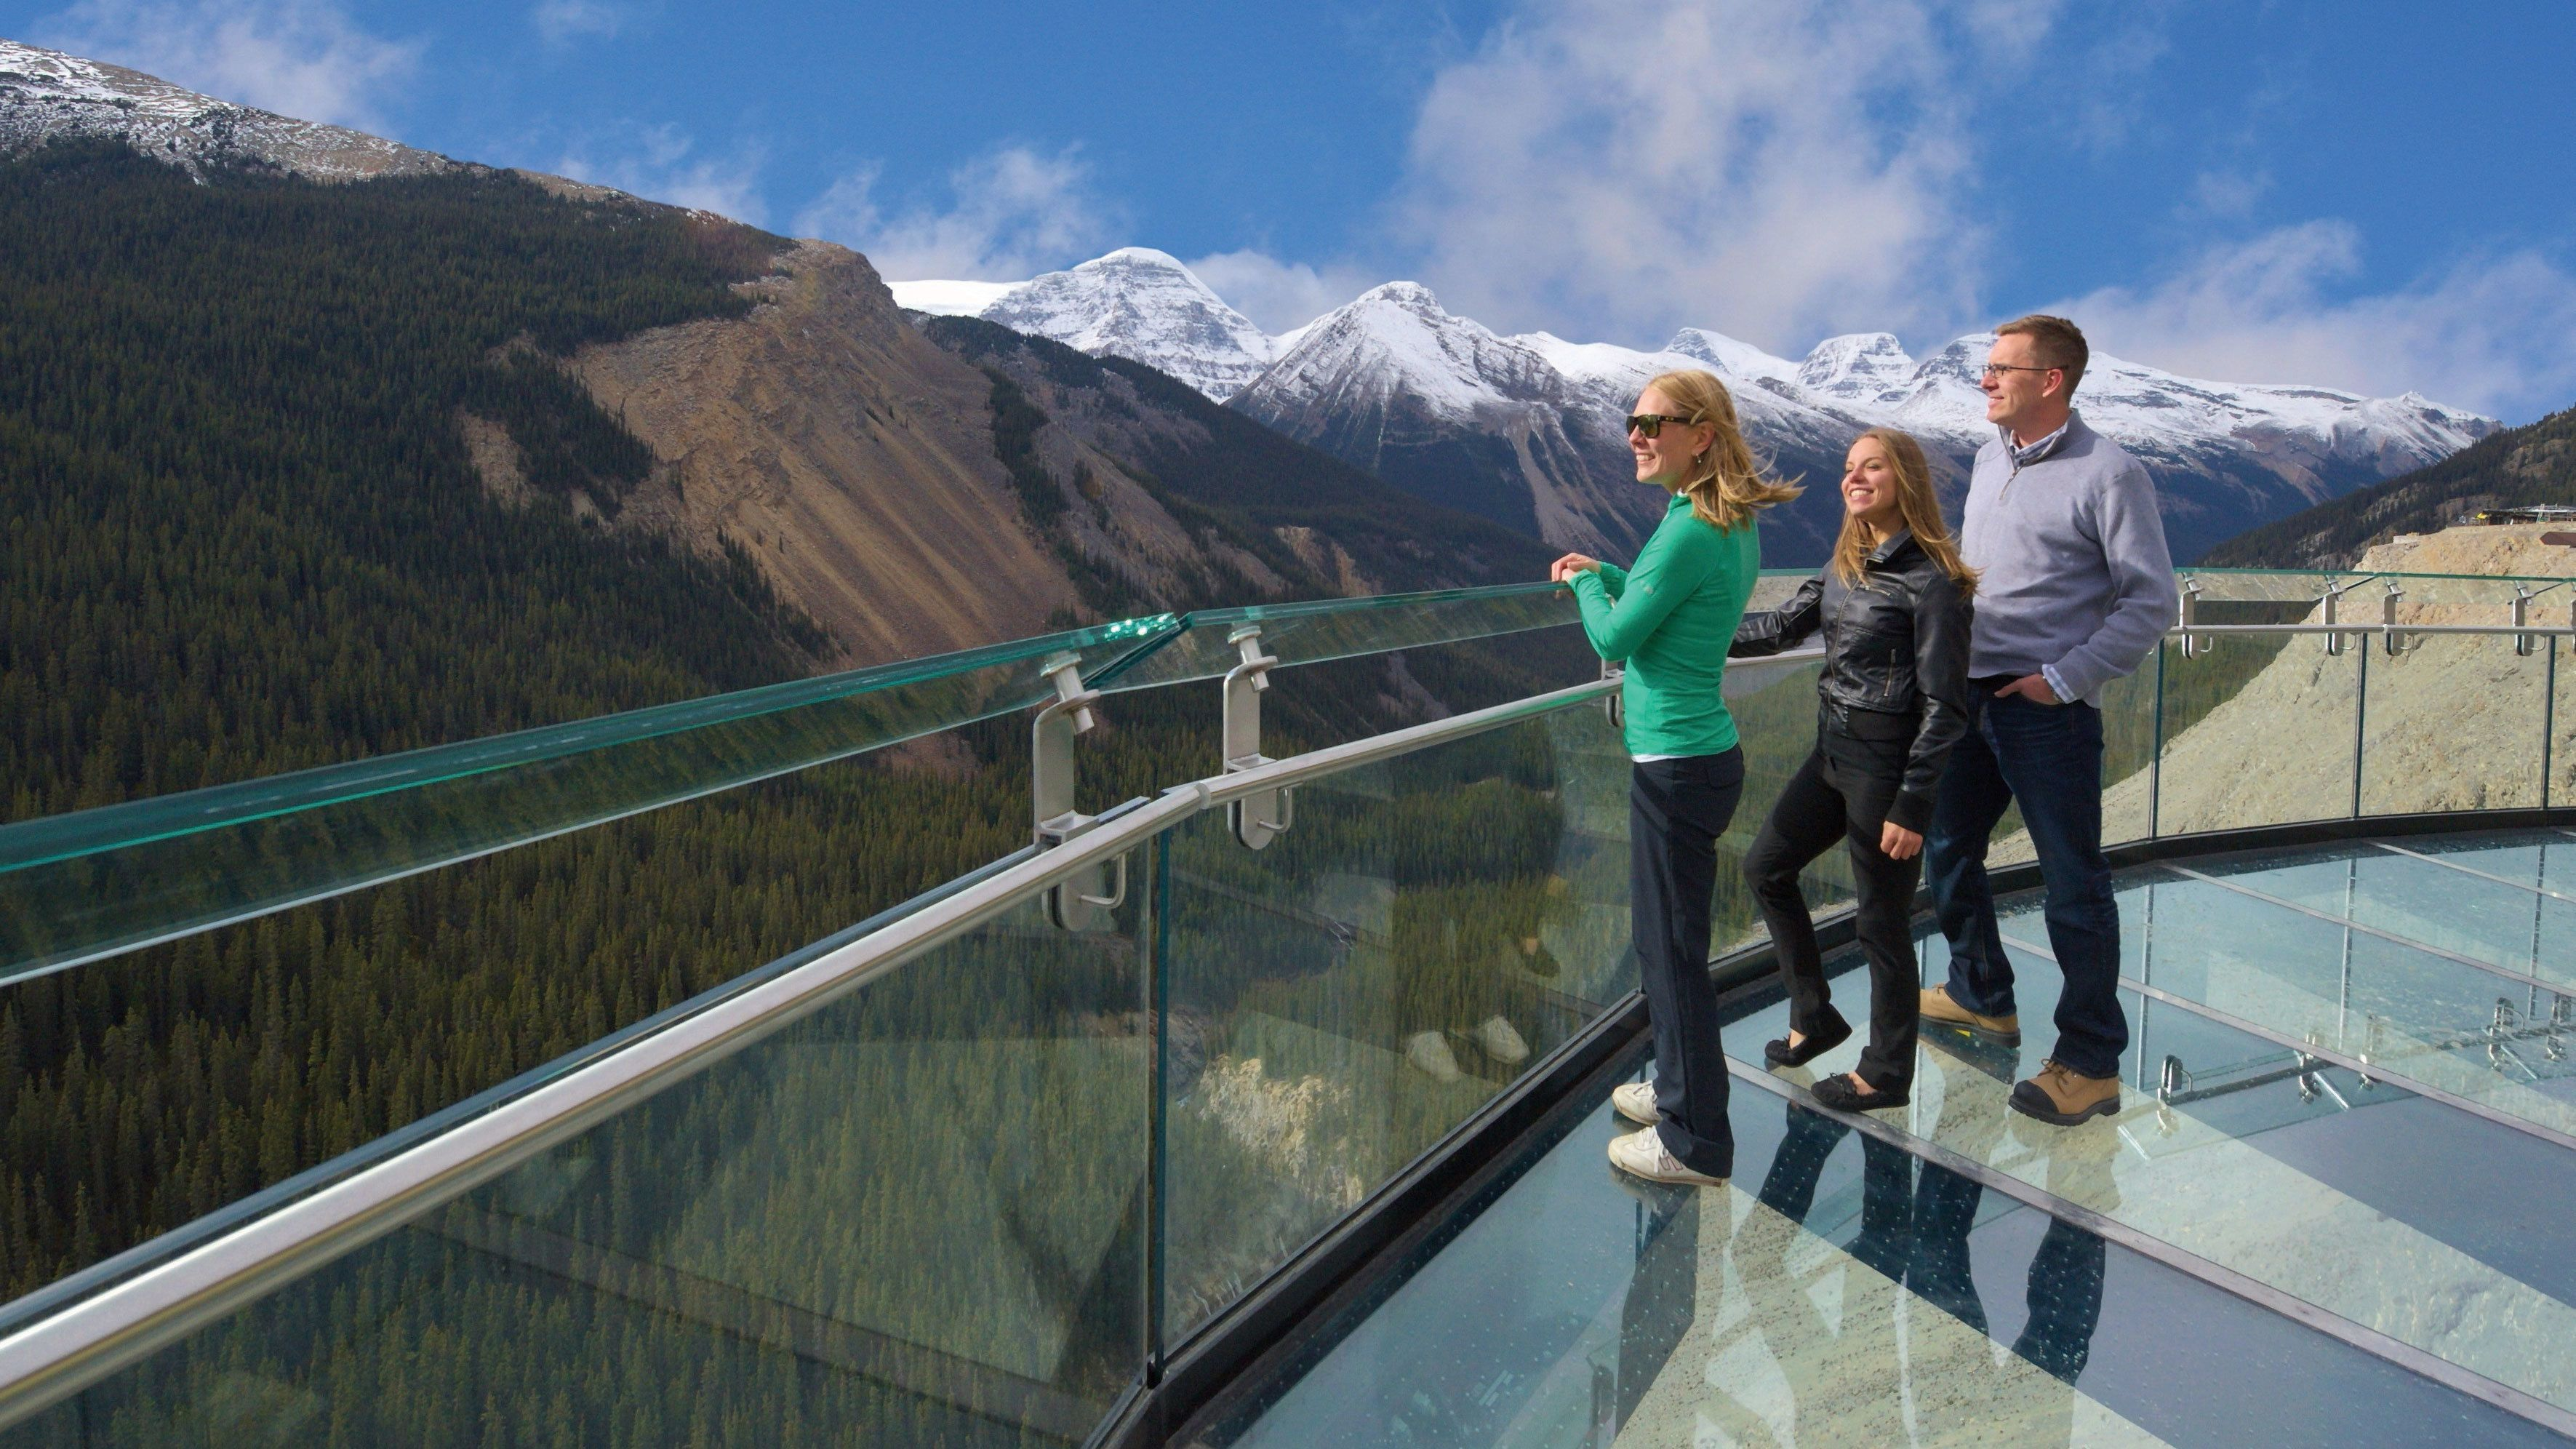 Enjoy the majestic views from the Glacier Skywalk